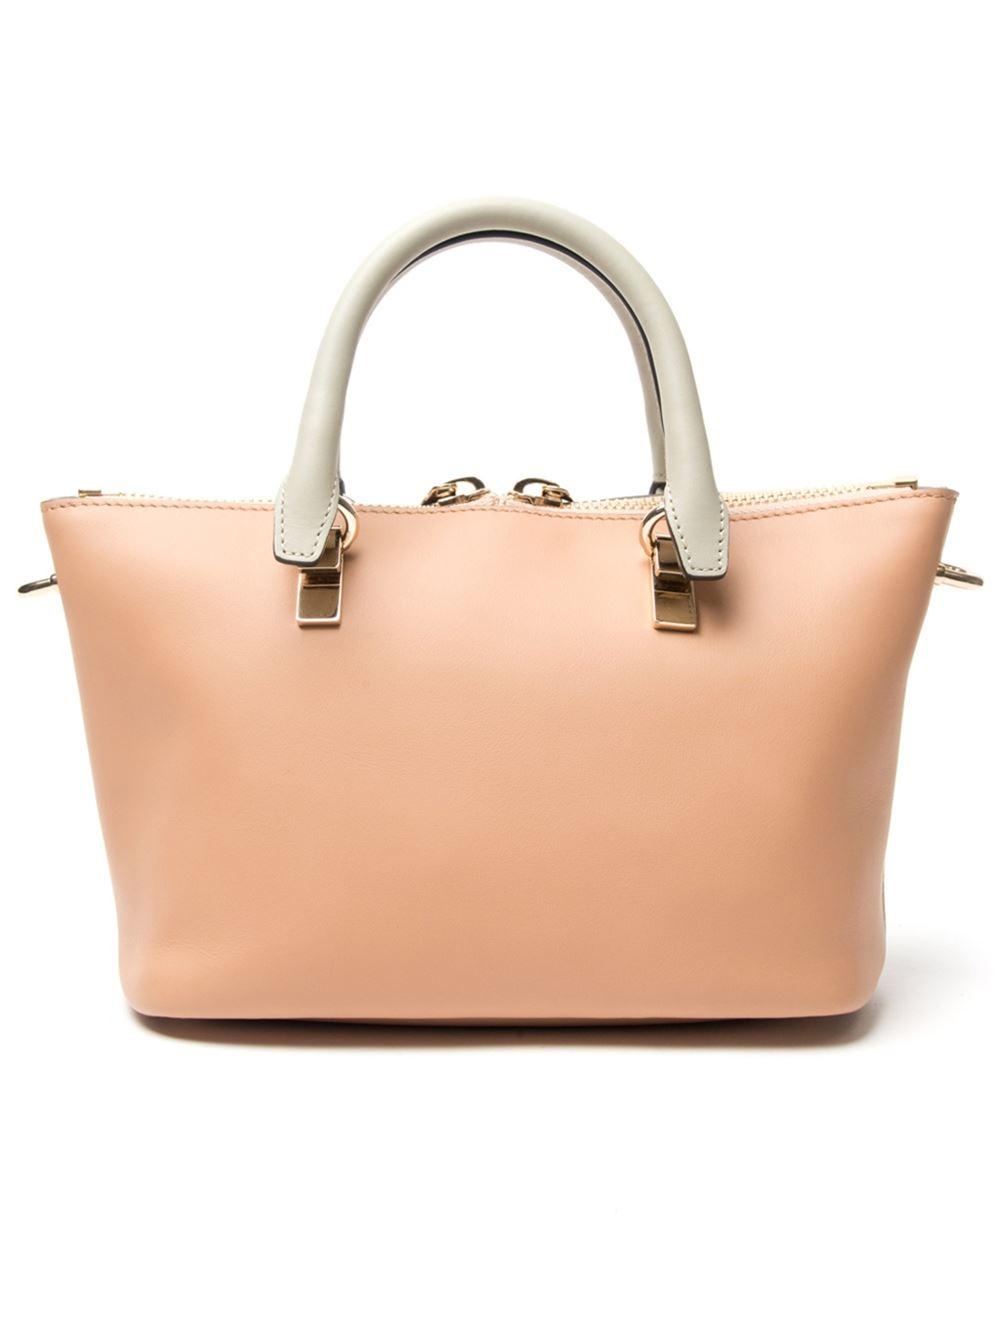 chloe wallets and purses - chloe small baylee tote, marcie chloe bag replica